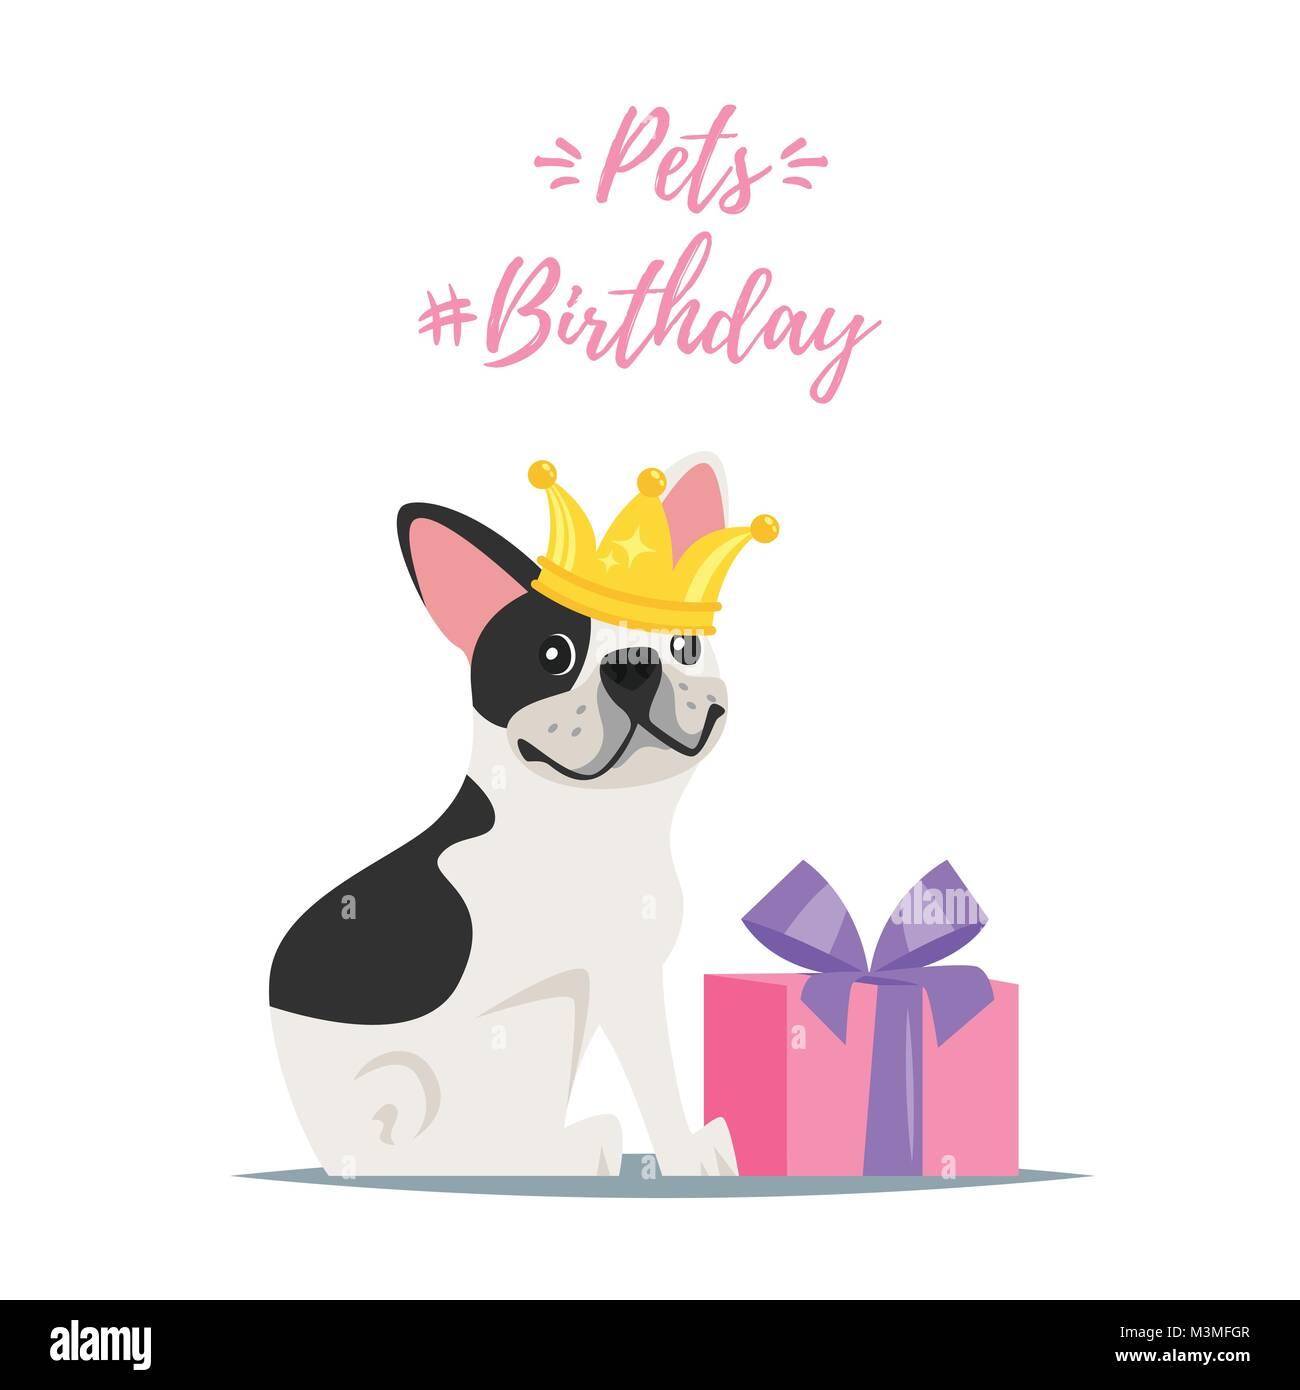 Vector cartoon style illustration of pets birthday greeting card vector cartoon style illustration of pets birthday greeting card with present and happy dog french bulldog i n golden crown kristyandbryce Gallery